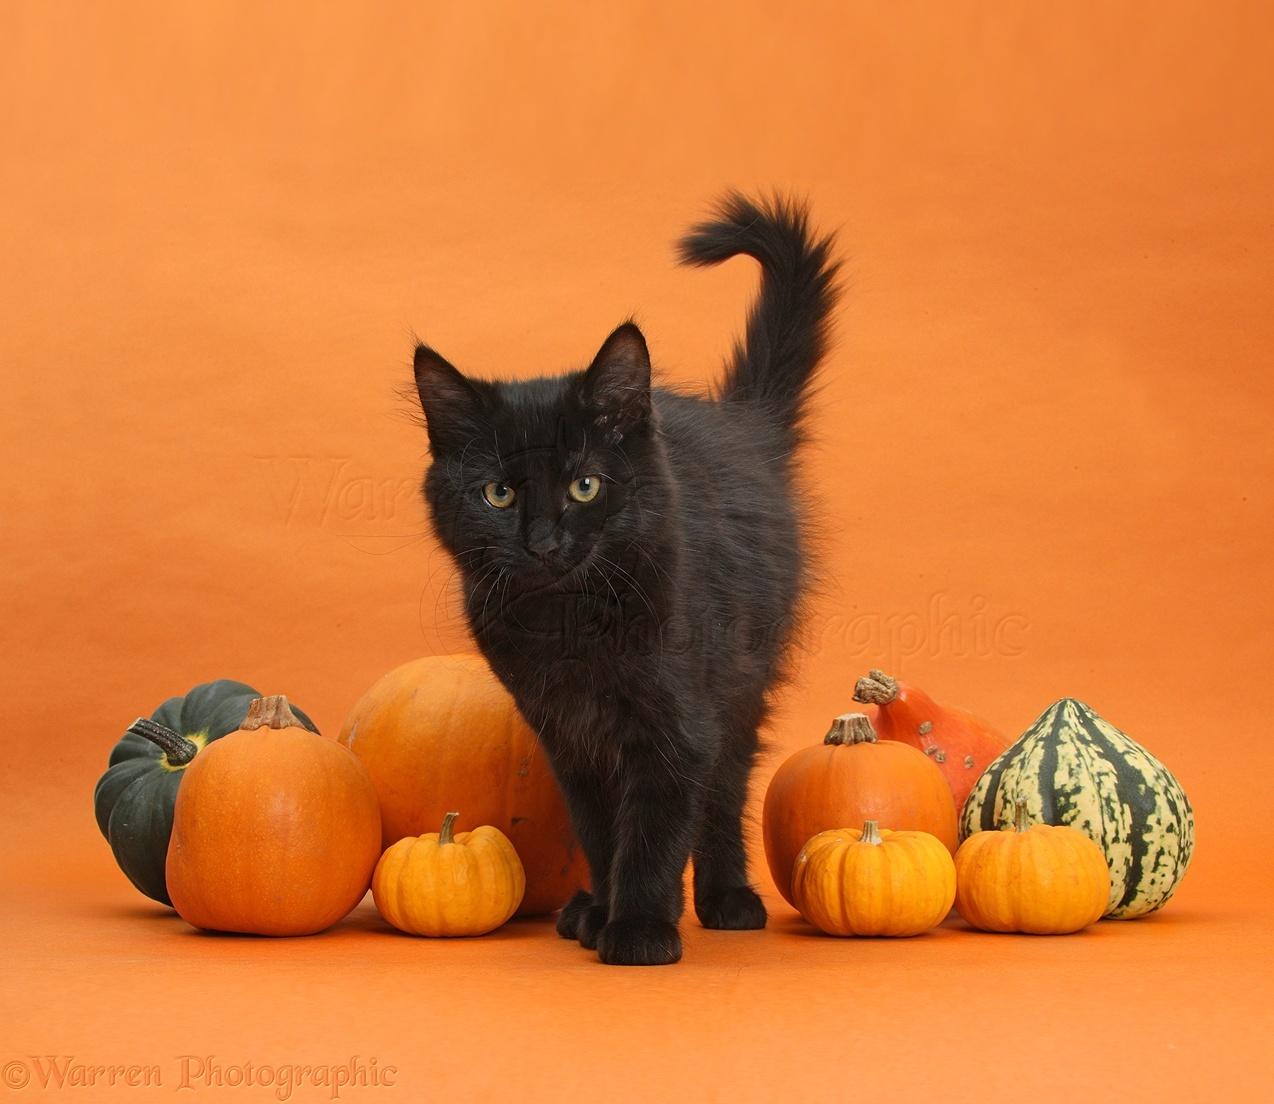 Black Maine Coon kitten and pumpkins photo - WP36708 Tabby Maine Coon Kitten